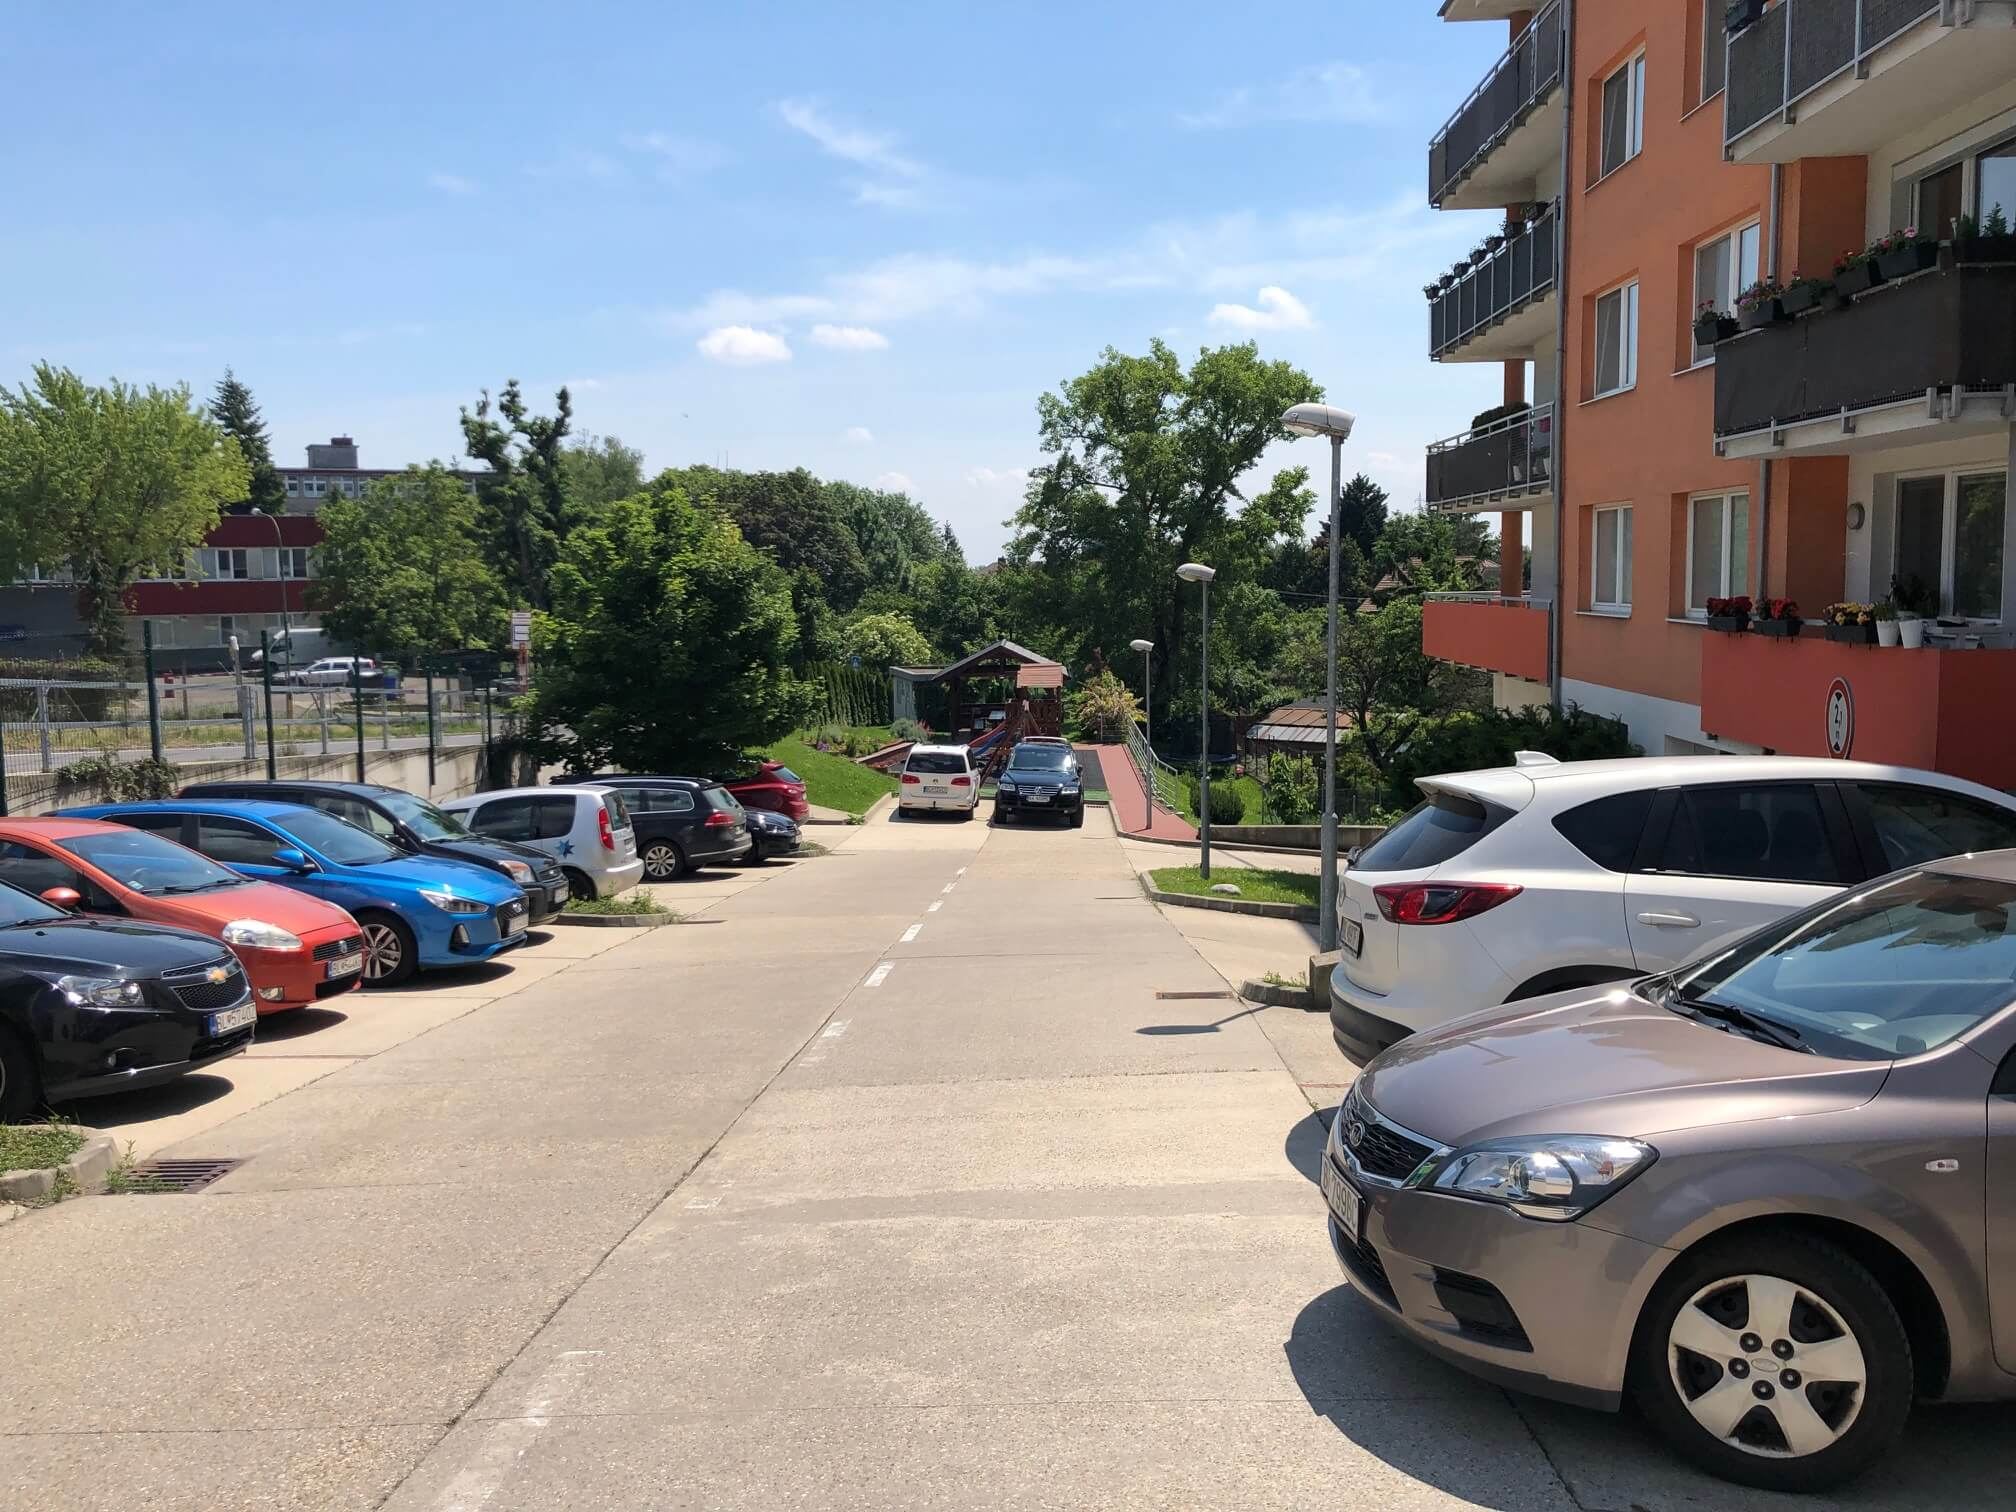 Rezervované: 3 izbový byt, novostavba, 72,25m2, loggia 4,82m2, Staré Grunty, Karlovka, garážové státie-72